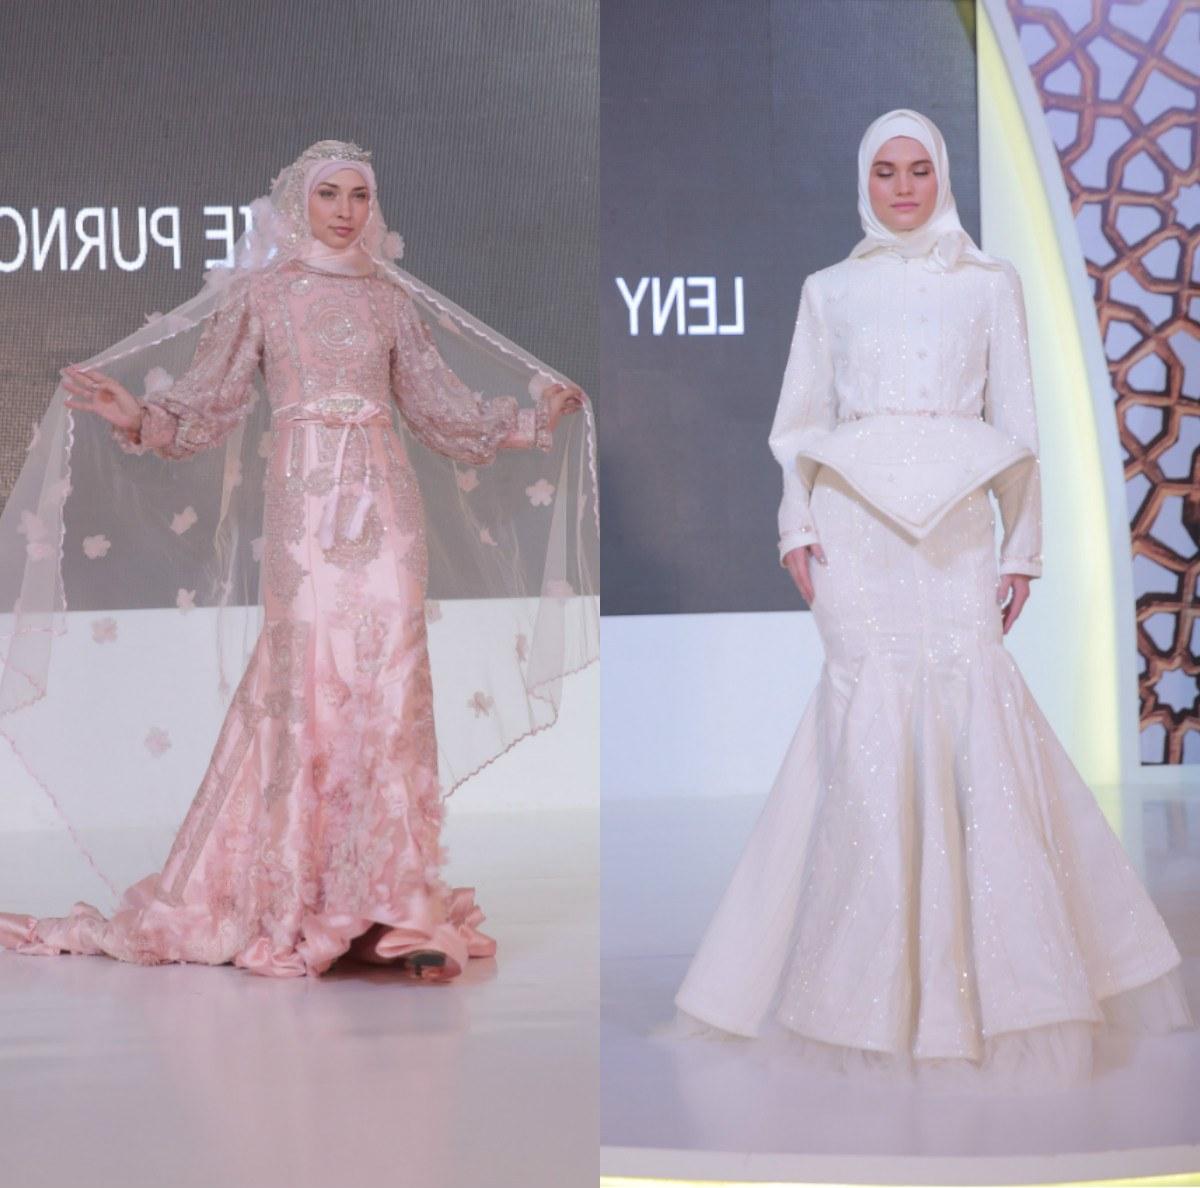 Inspirasi Gaun Pesta Pengantin Muslimah 87dx Kemeriahan Ramadan Runway 2020